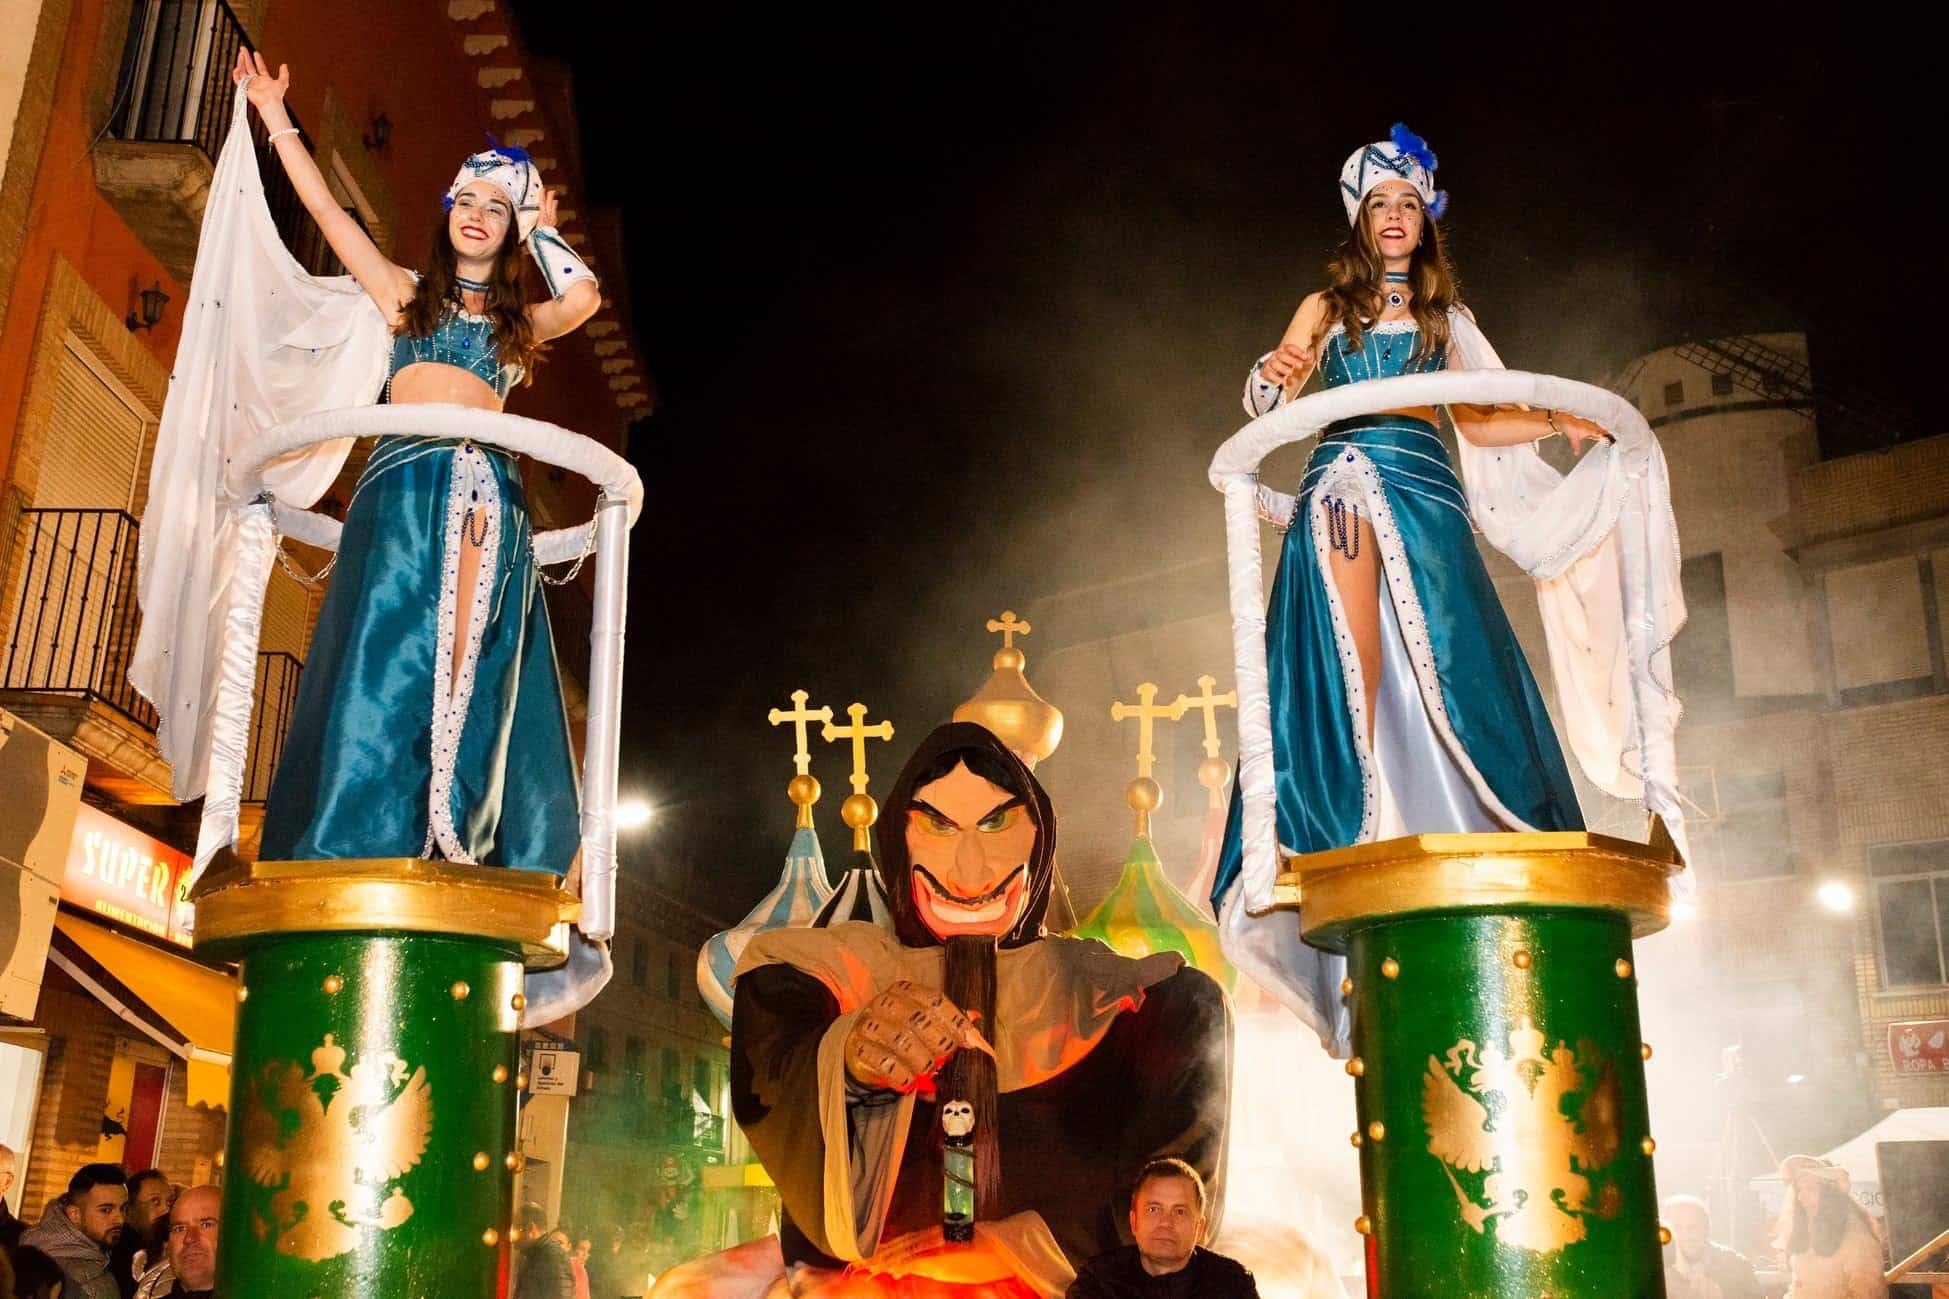 Carnaval de herencia 2020 ofertorio 103 - Selección de fotografías del Ofertorio del Carnaval de Herencia